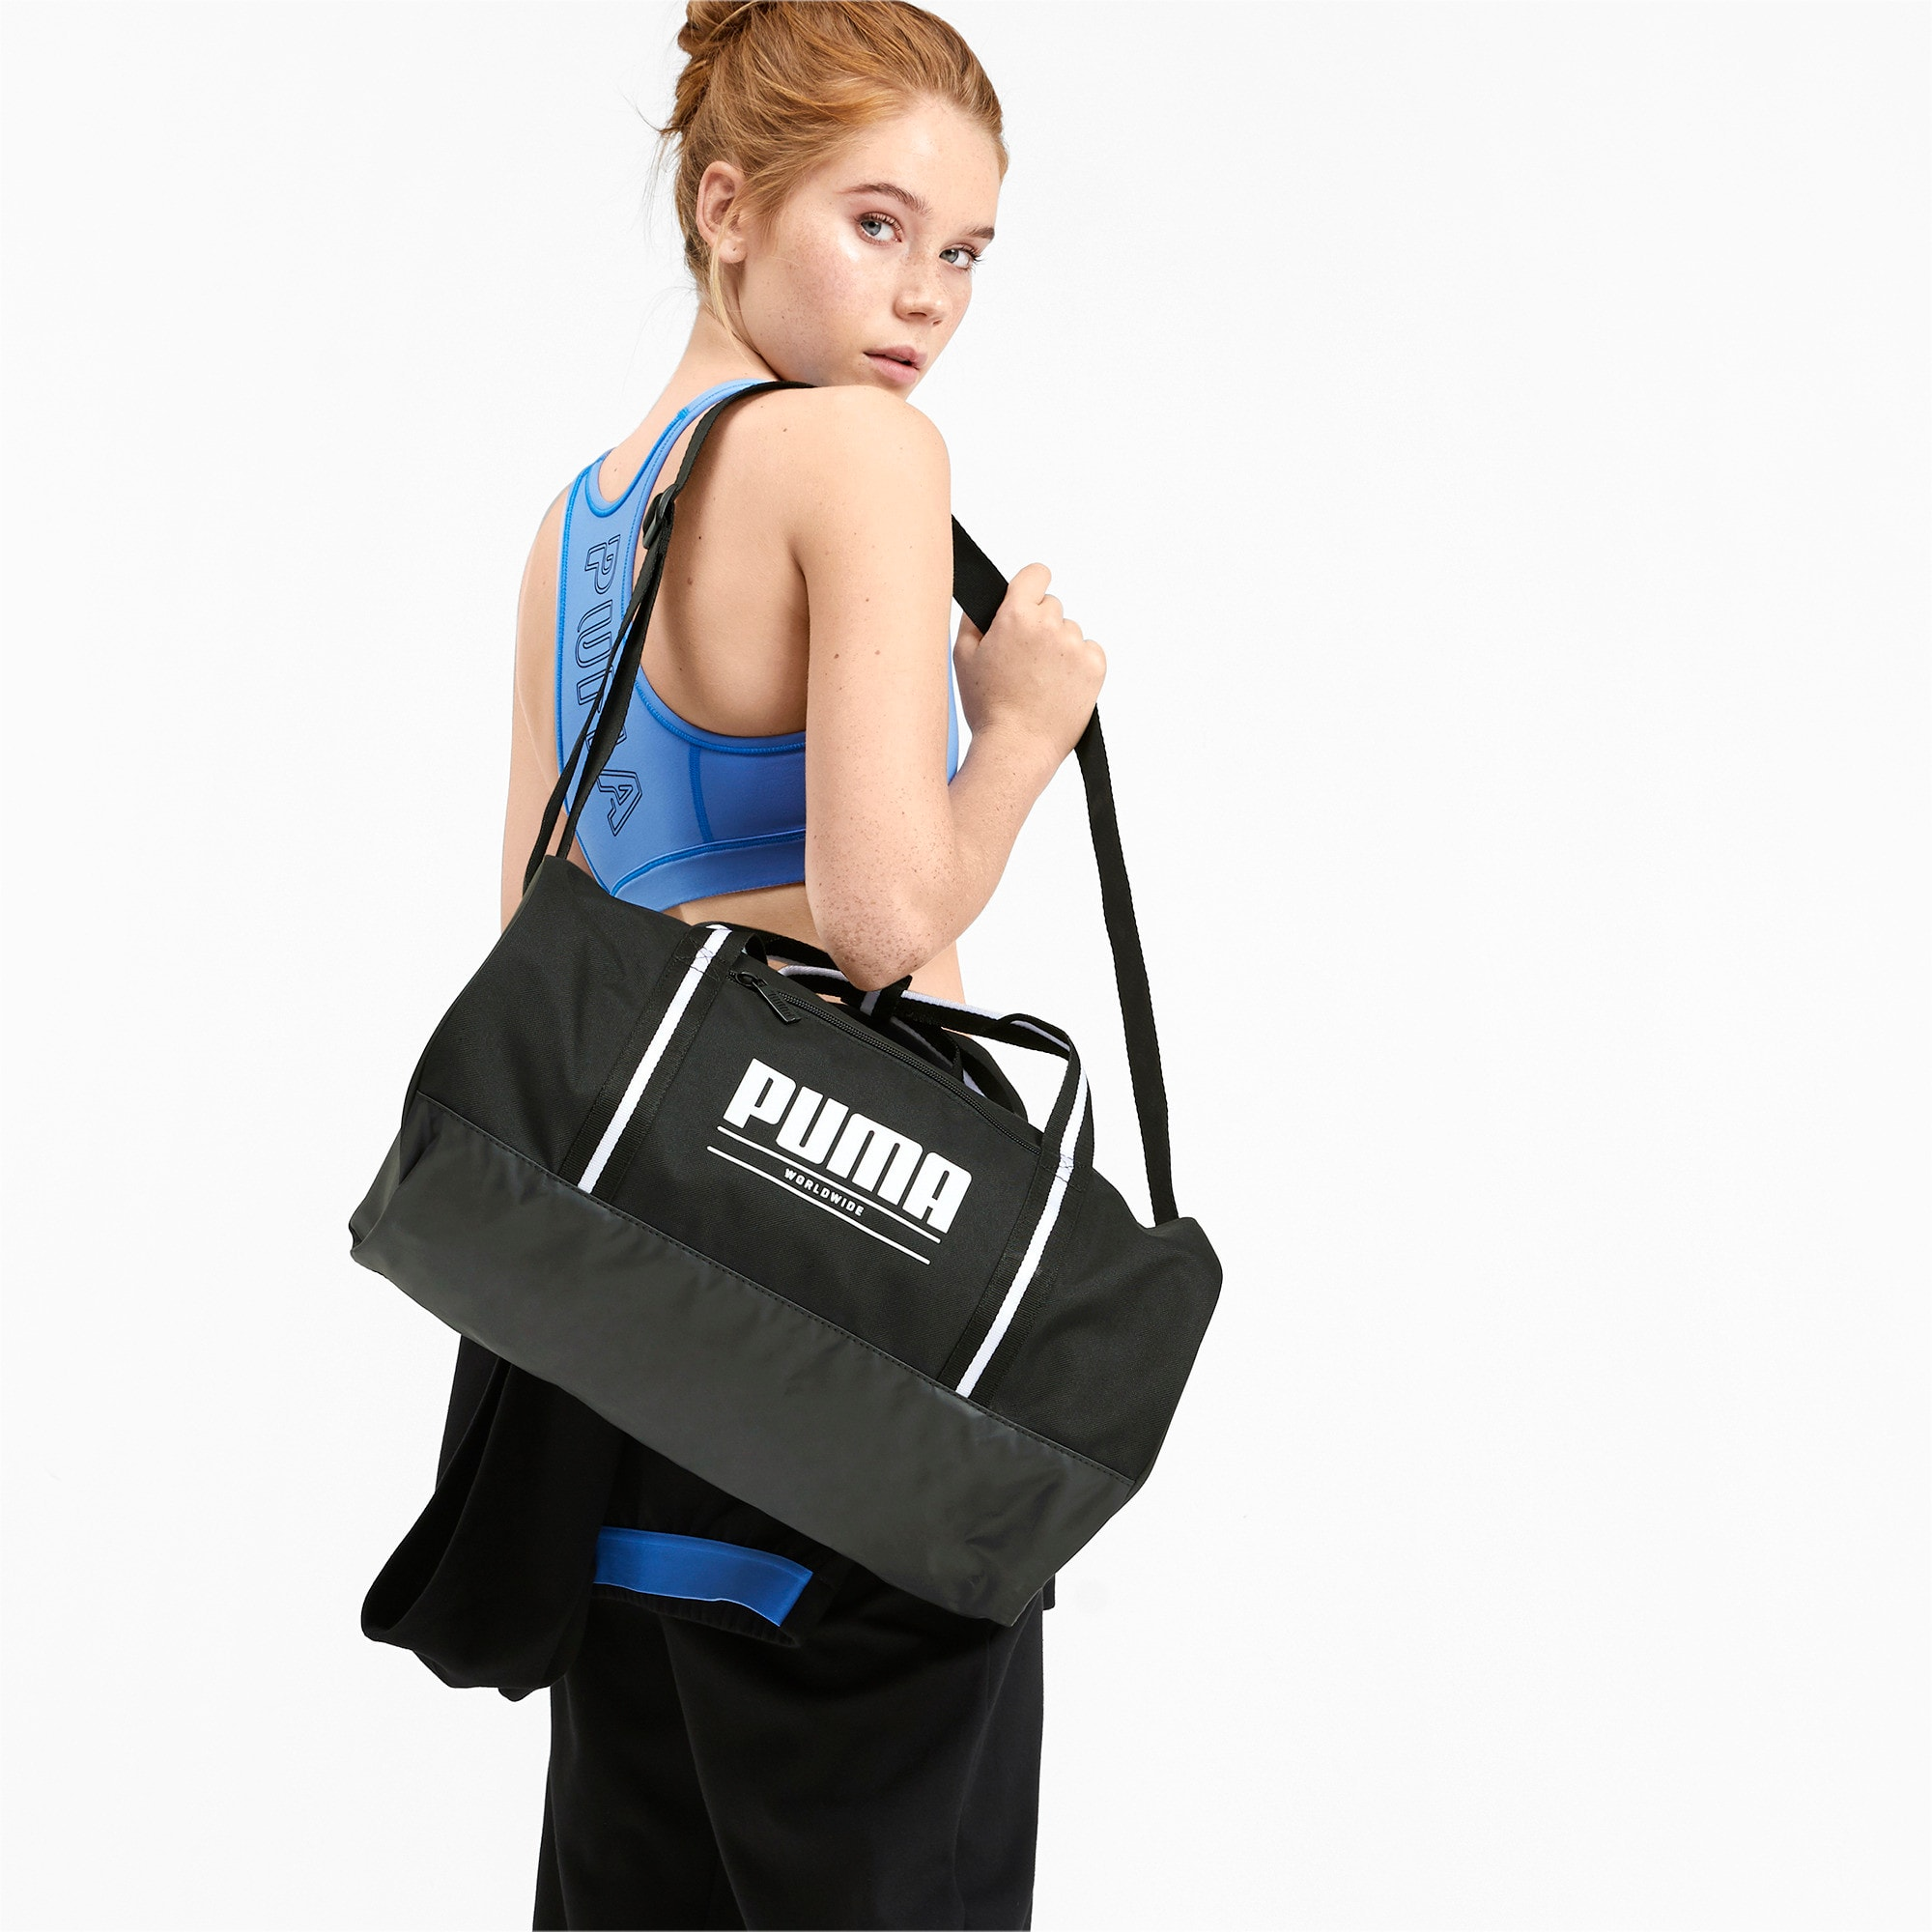 Thumbnail 2 of Base Women's Barrel Bag, Puma Black, medium-IND